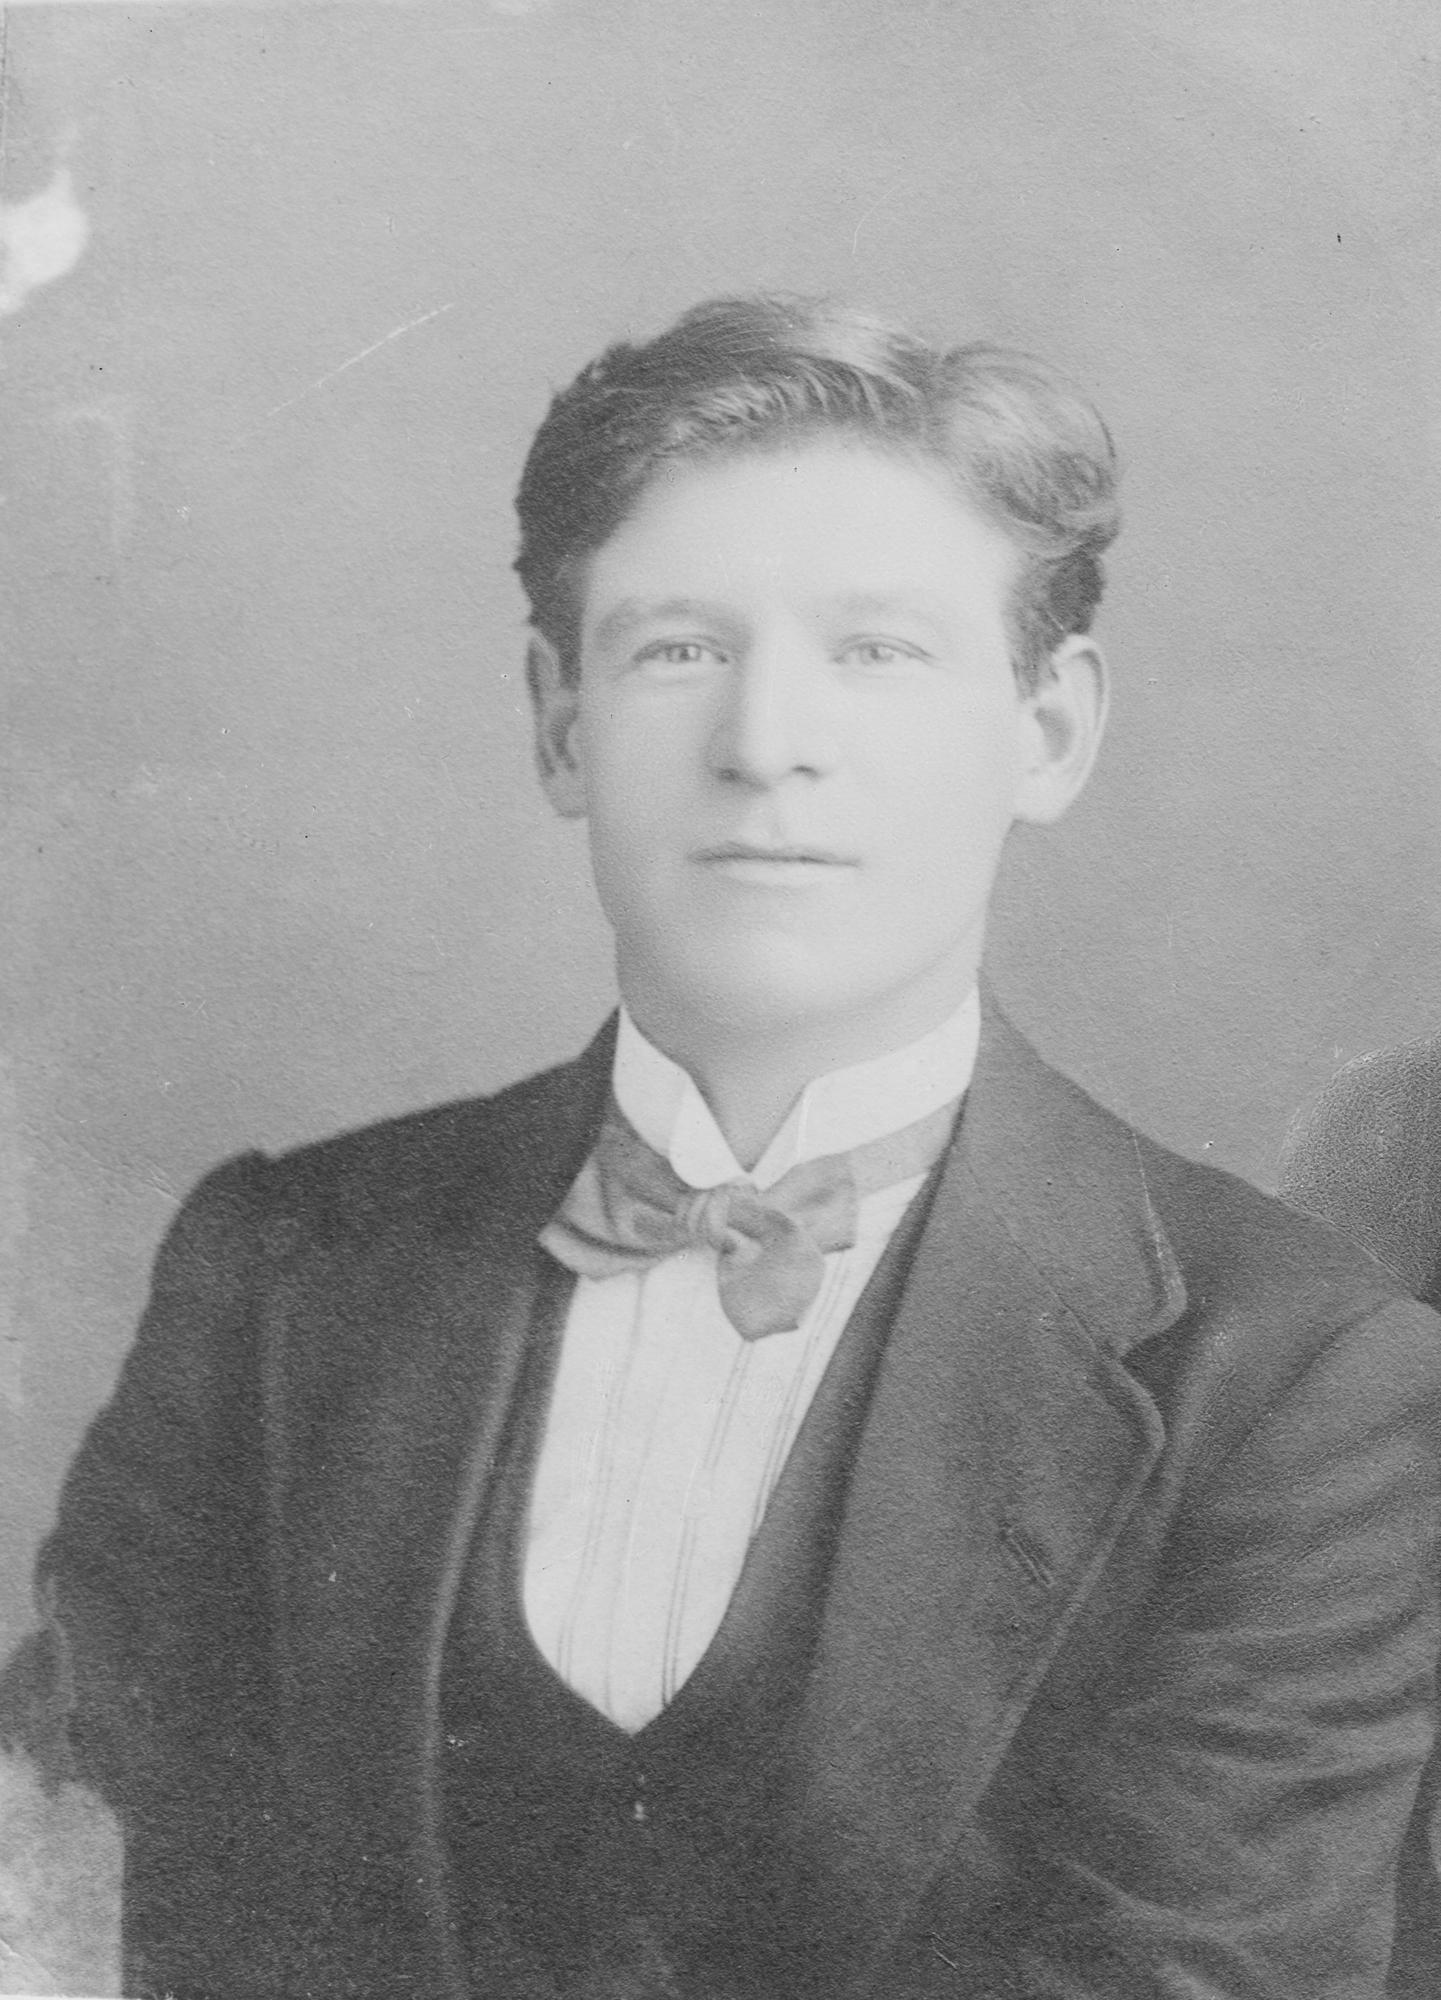 Doyle, half-length portrait